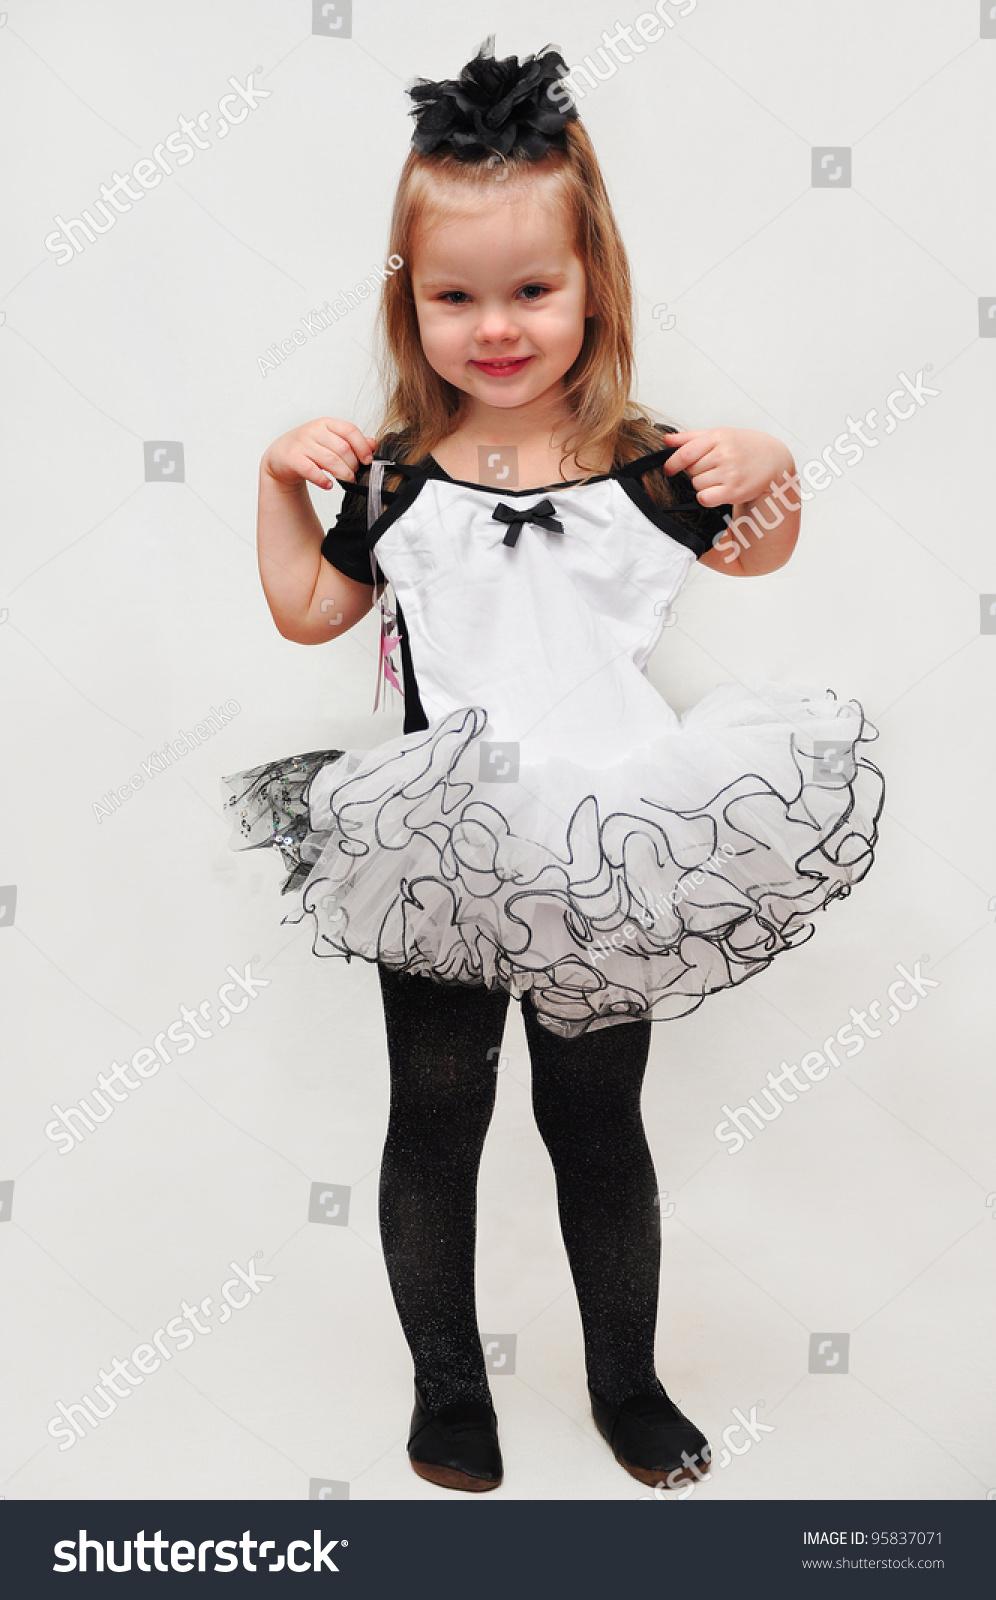 Young girl ballerina models #8